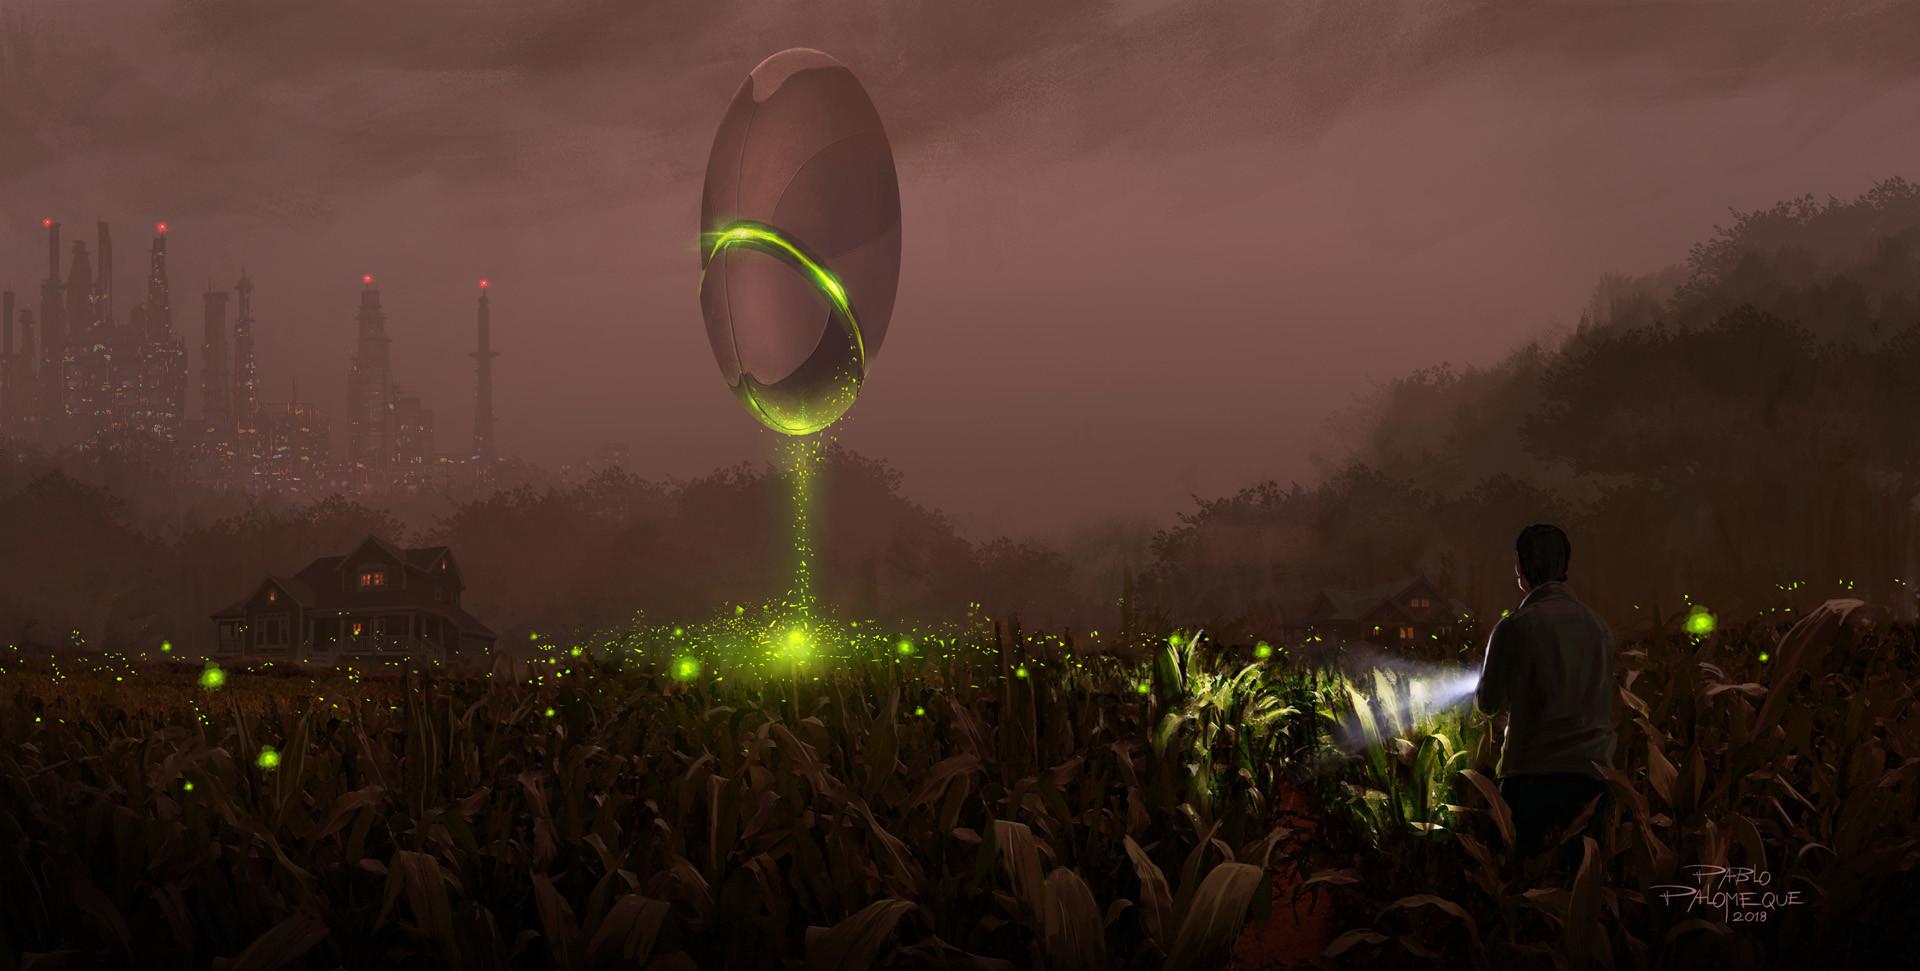 Pablo palomeque fireflies